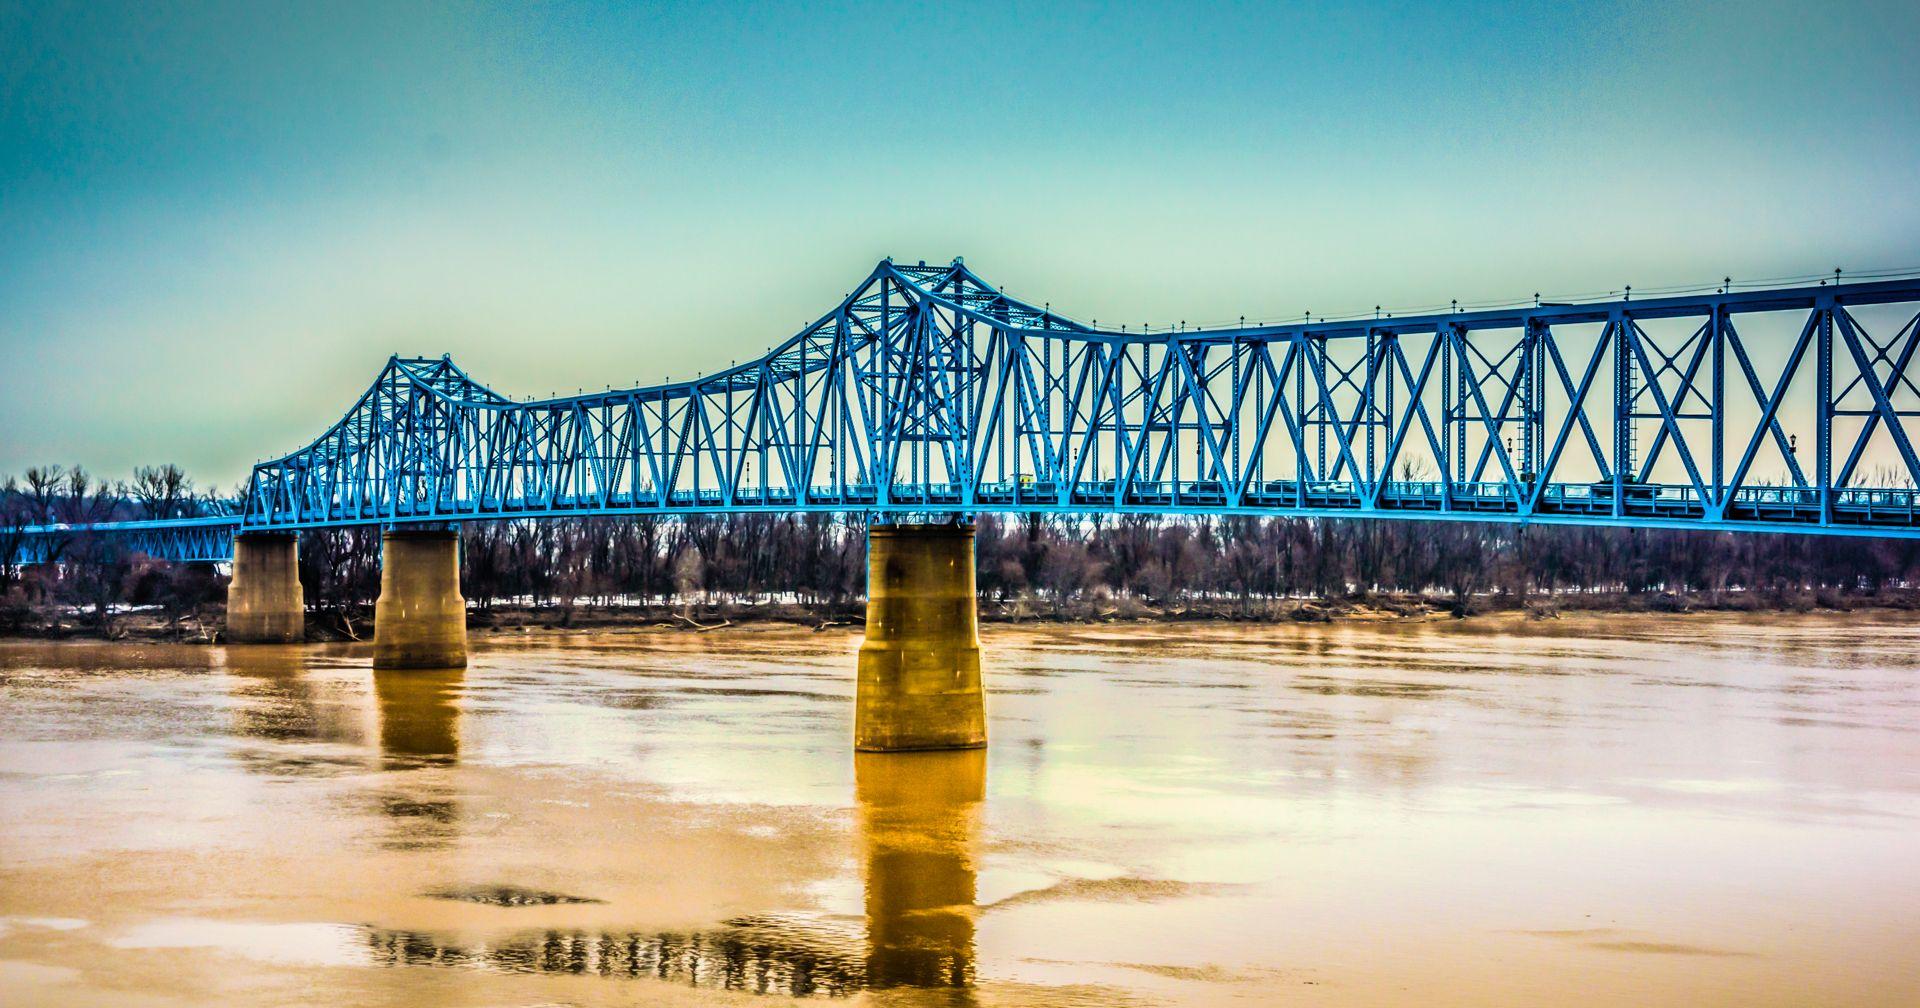 Pin by Steve Stepp on My Landscape Photography | Kentucky travel, Owensboro  kentucky, My old kentucky home